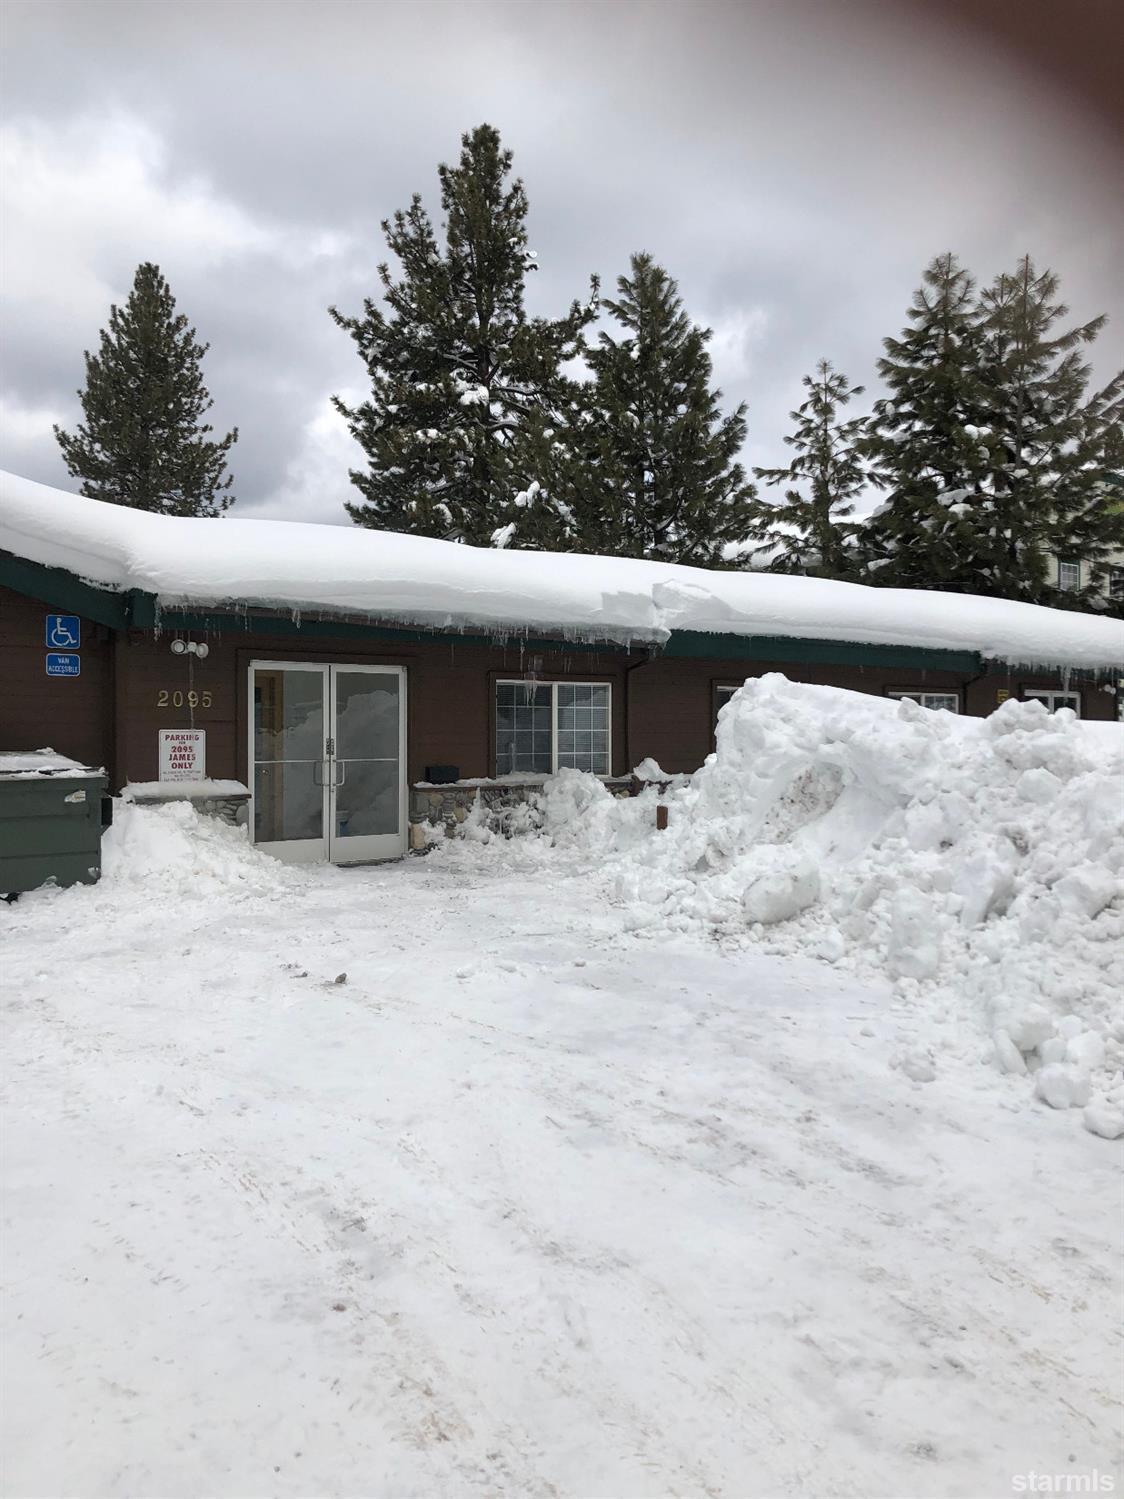 2095 James Ave, South Lake Tahoe, CA 96150, South Lake Tahoe, California 96150